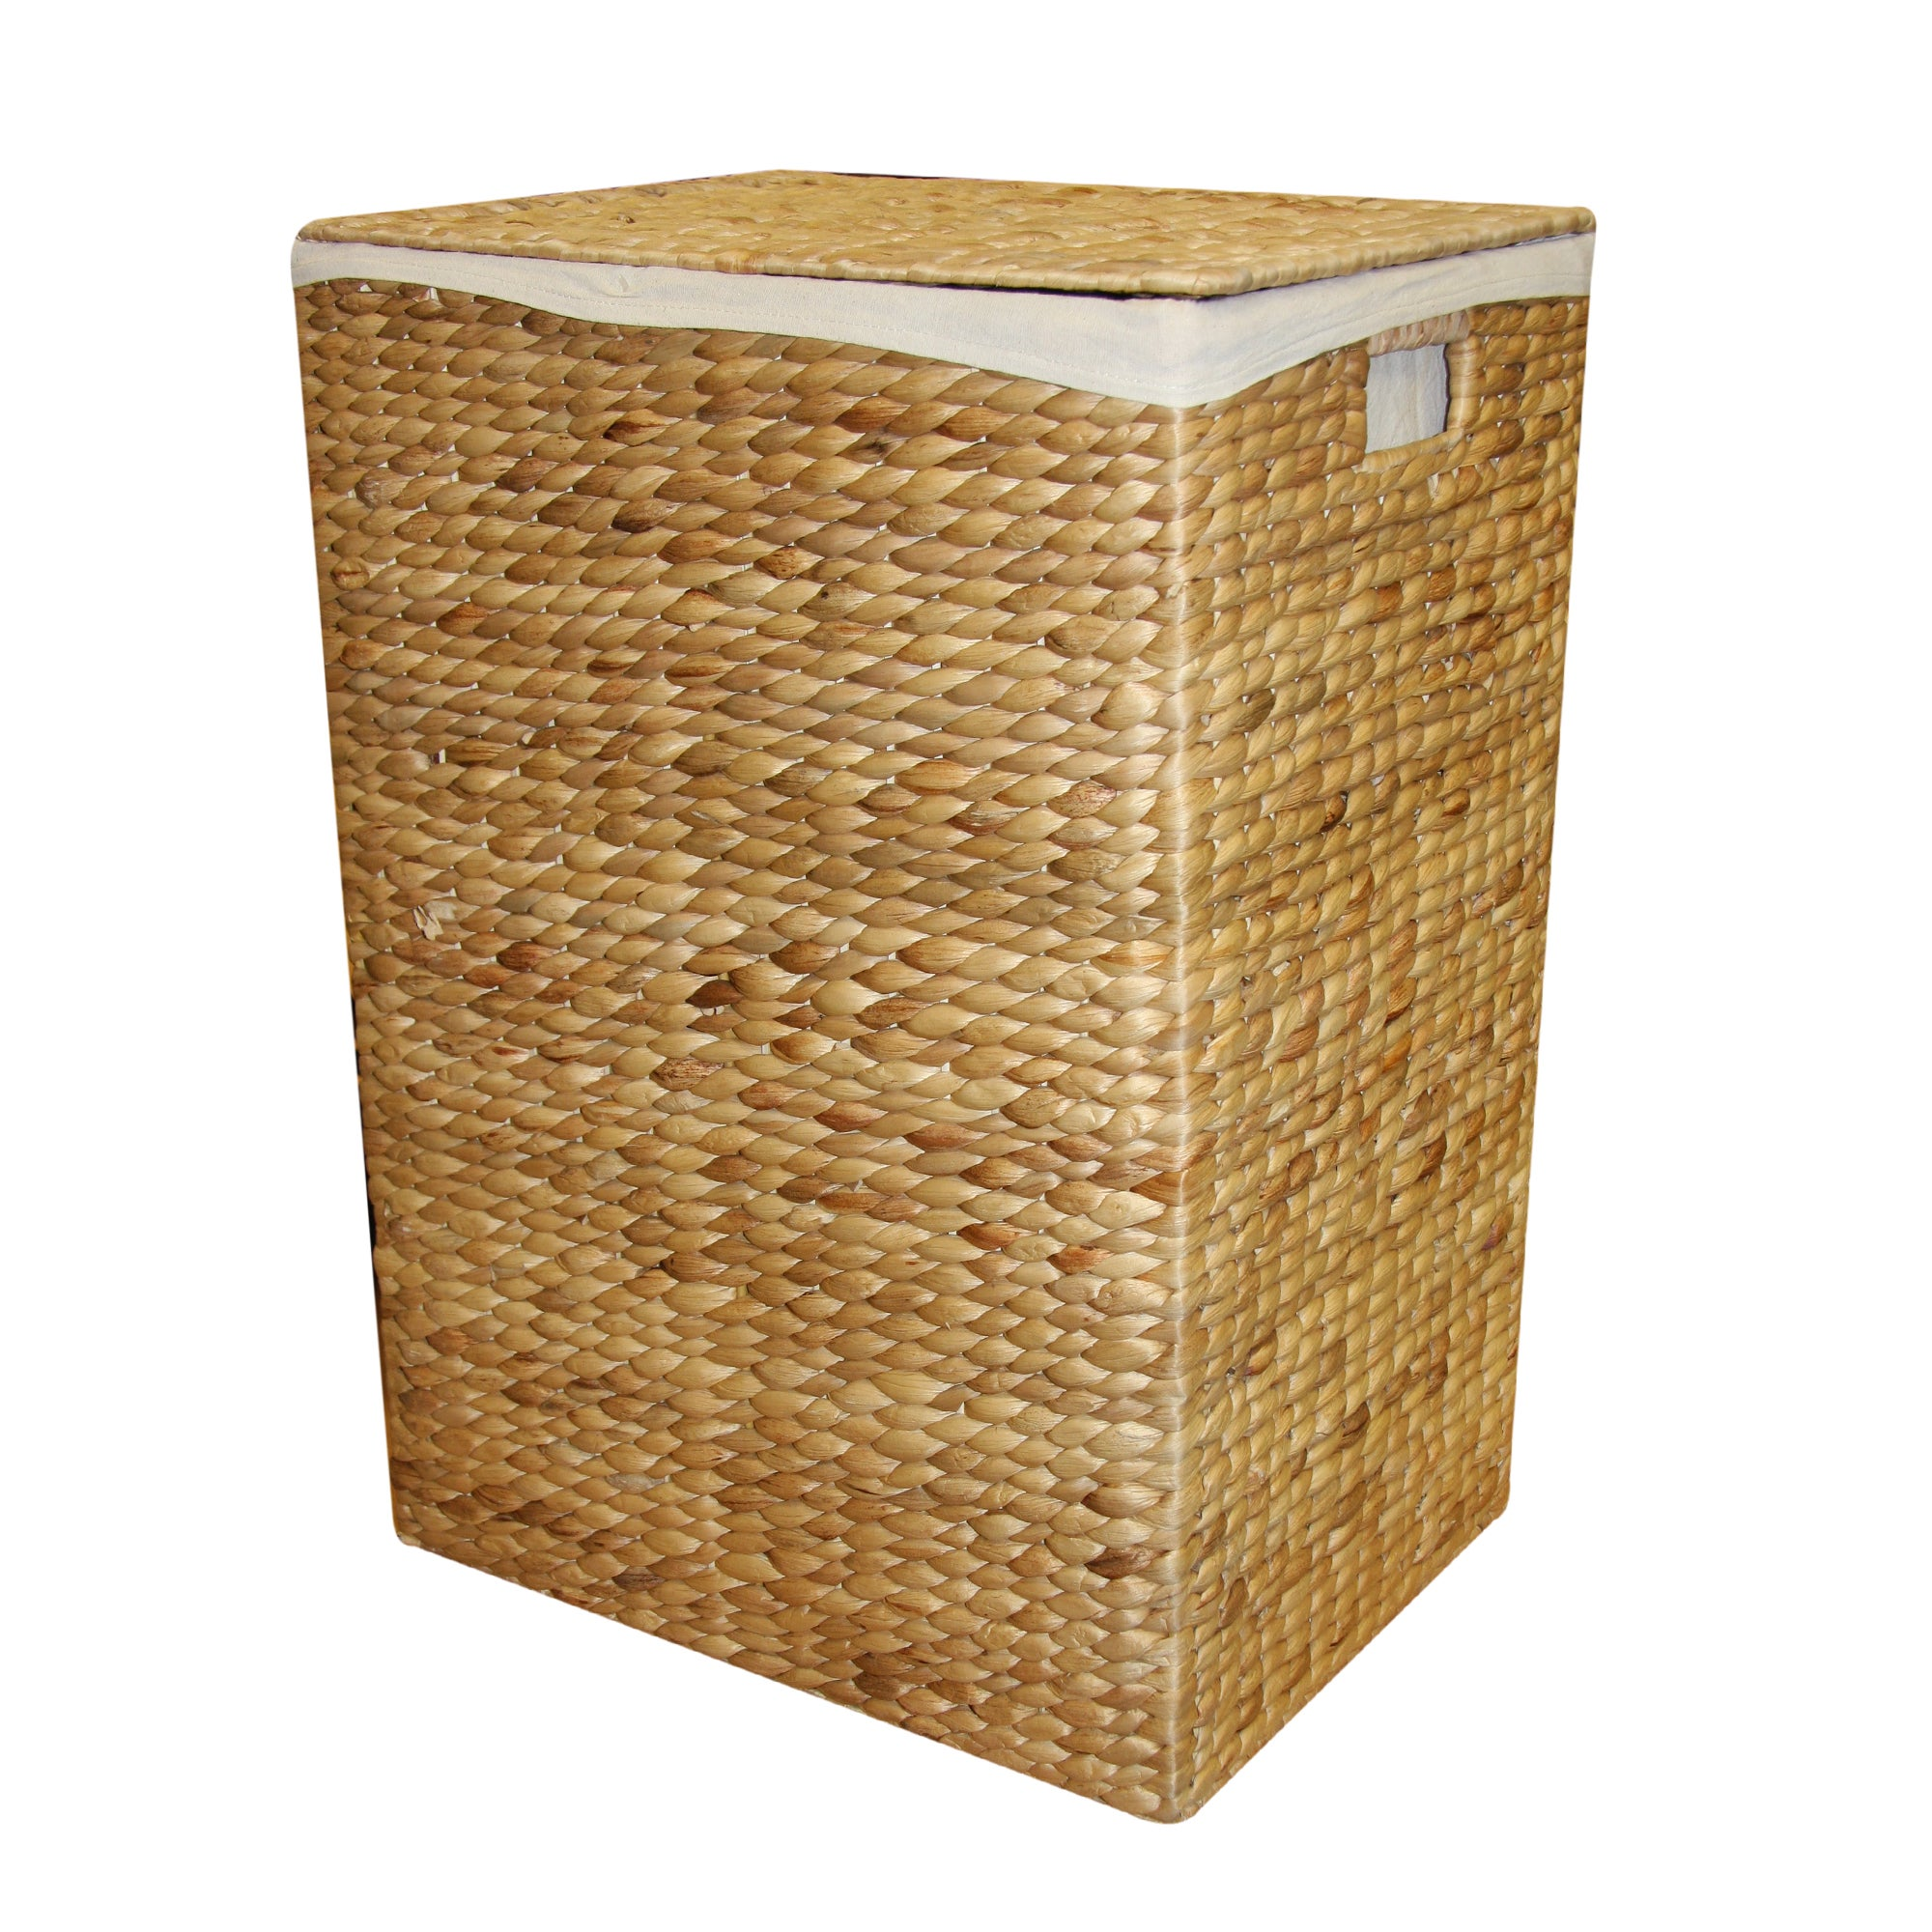 Hyacinth rectangle laundry hamper dunelm - Way laundry hamper ...